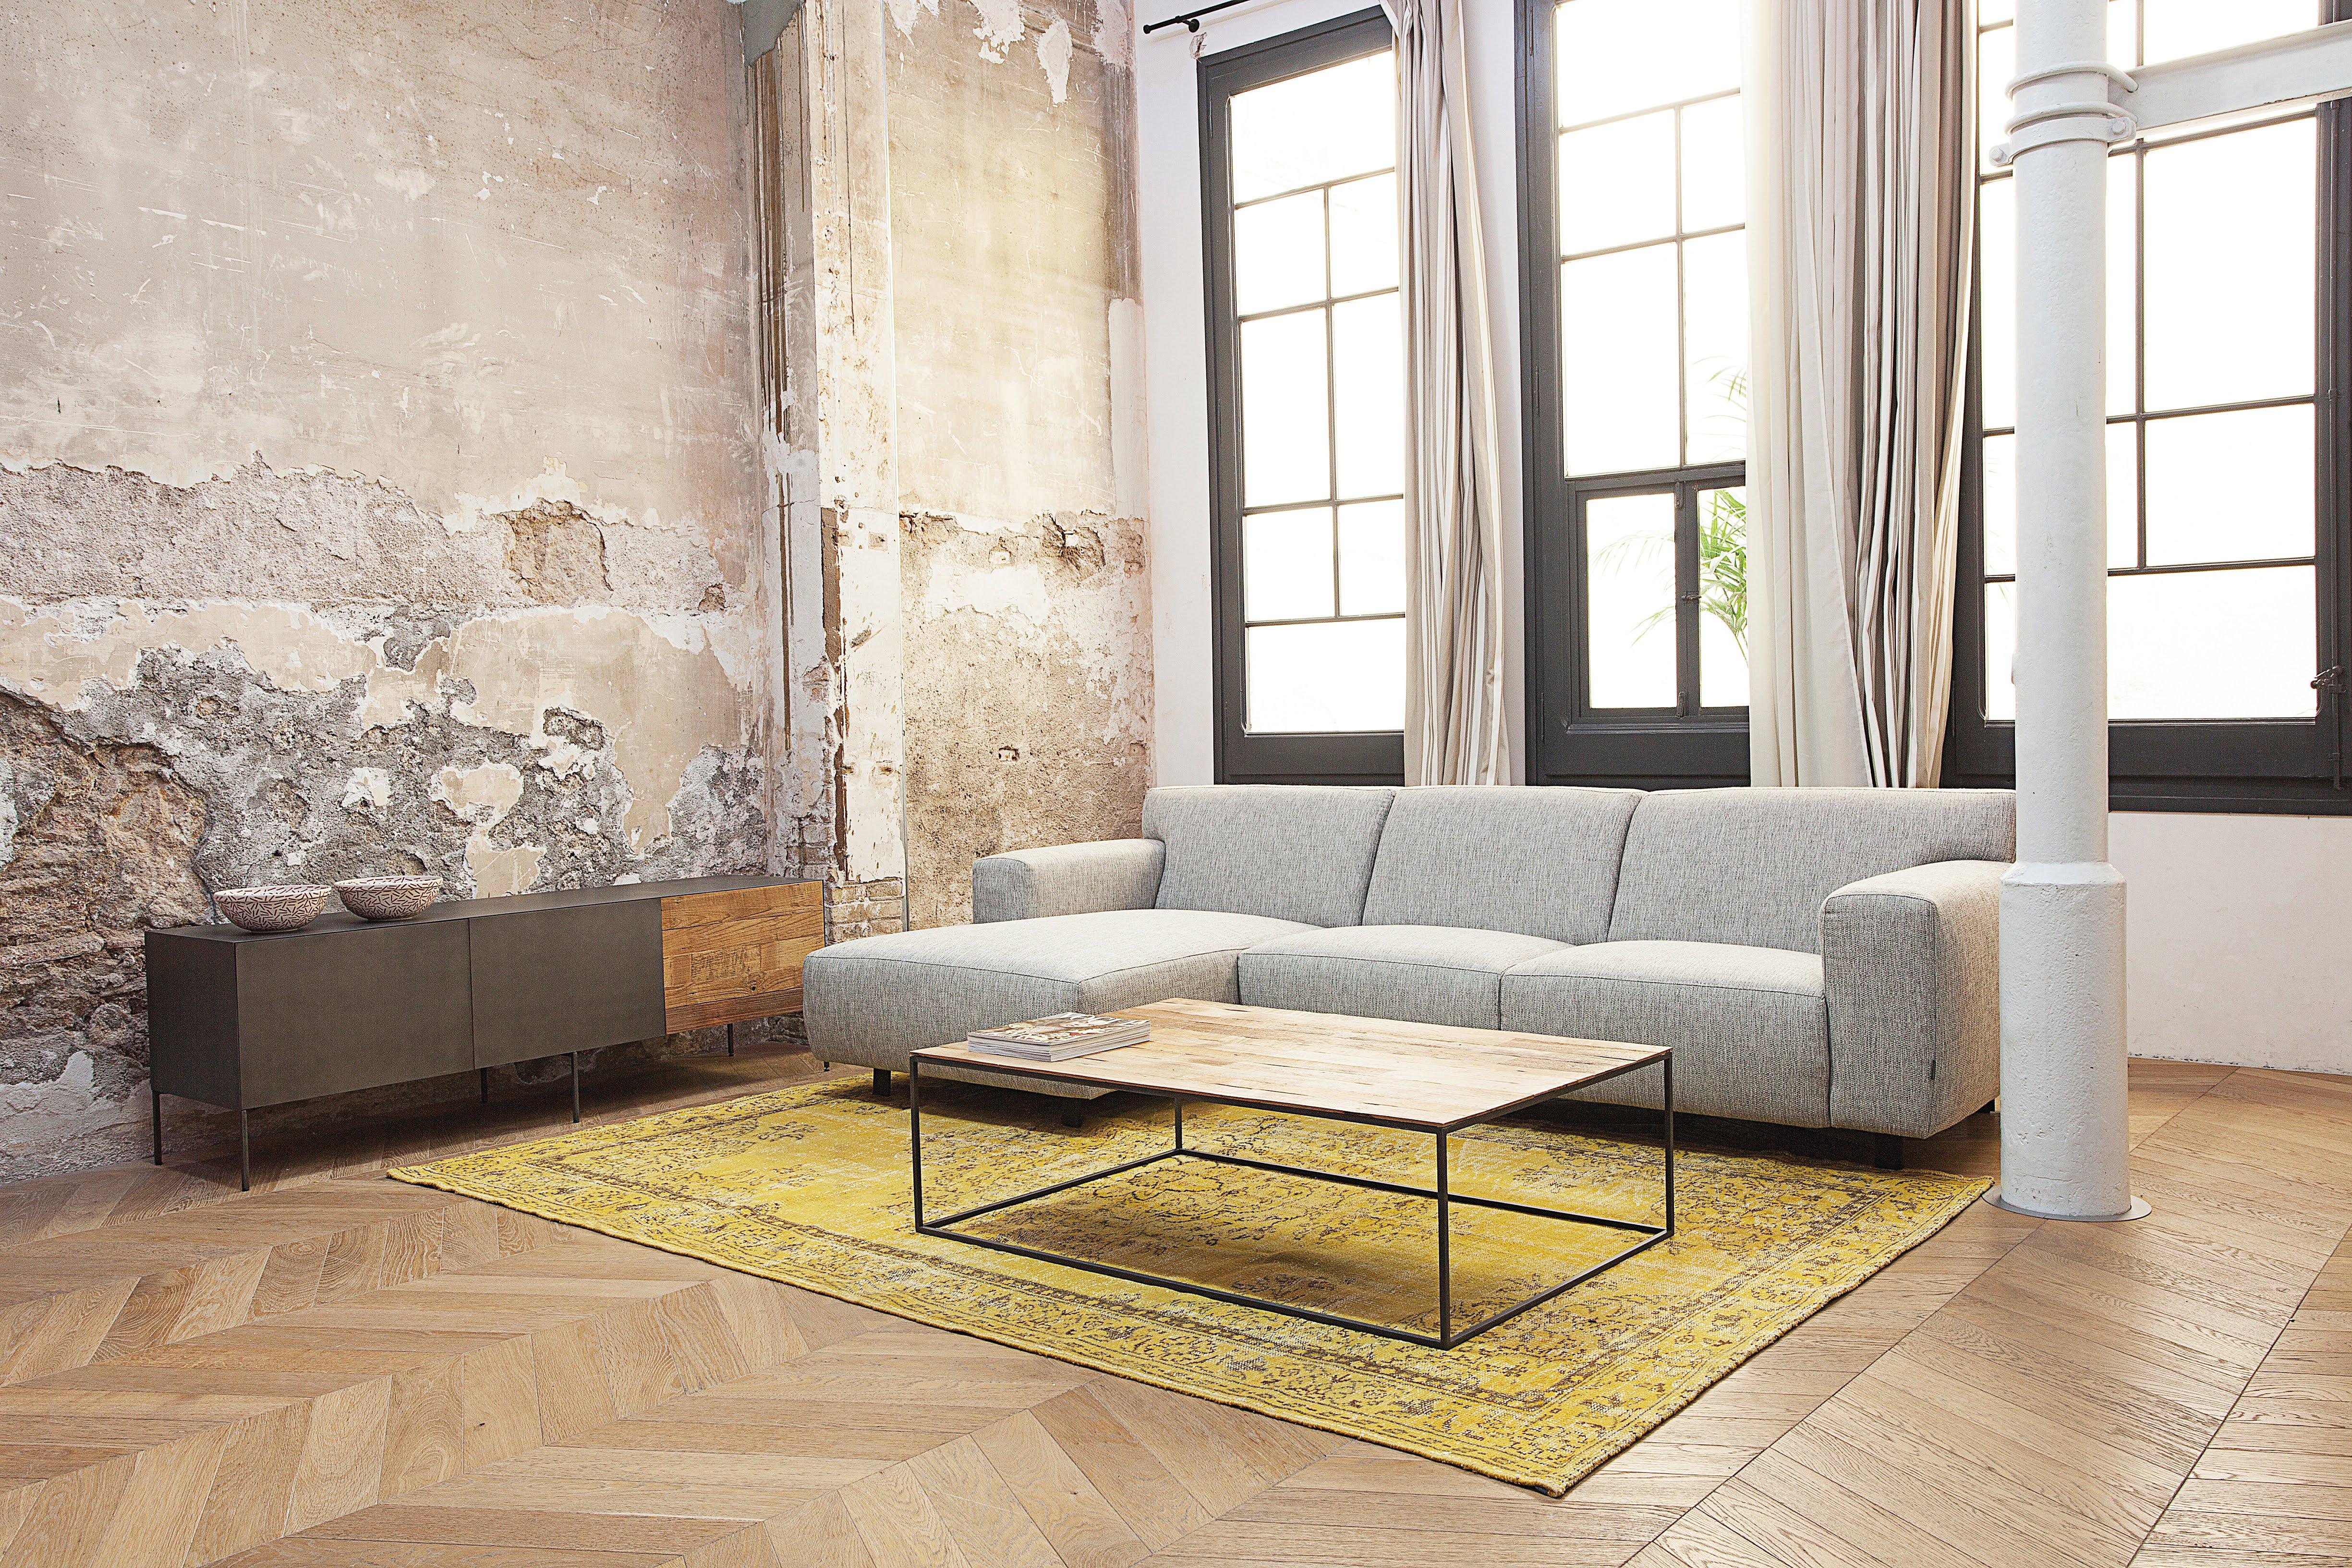 Design Tv Kast : Tv kast fusion teak metaal multicolor deba meubelen